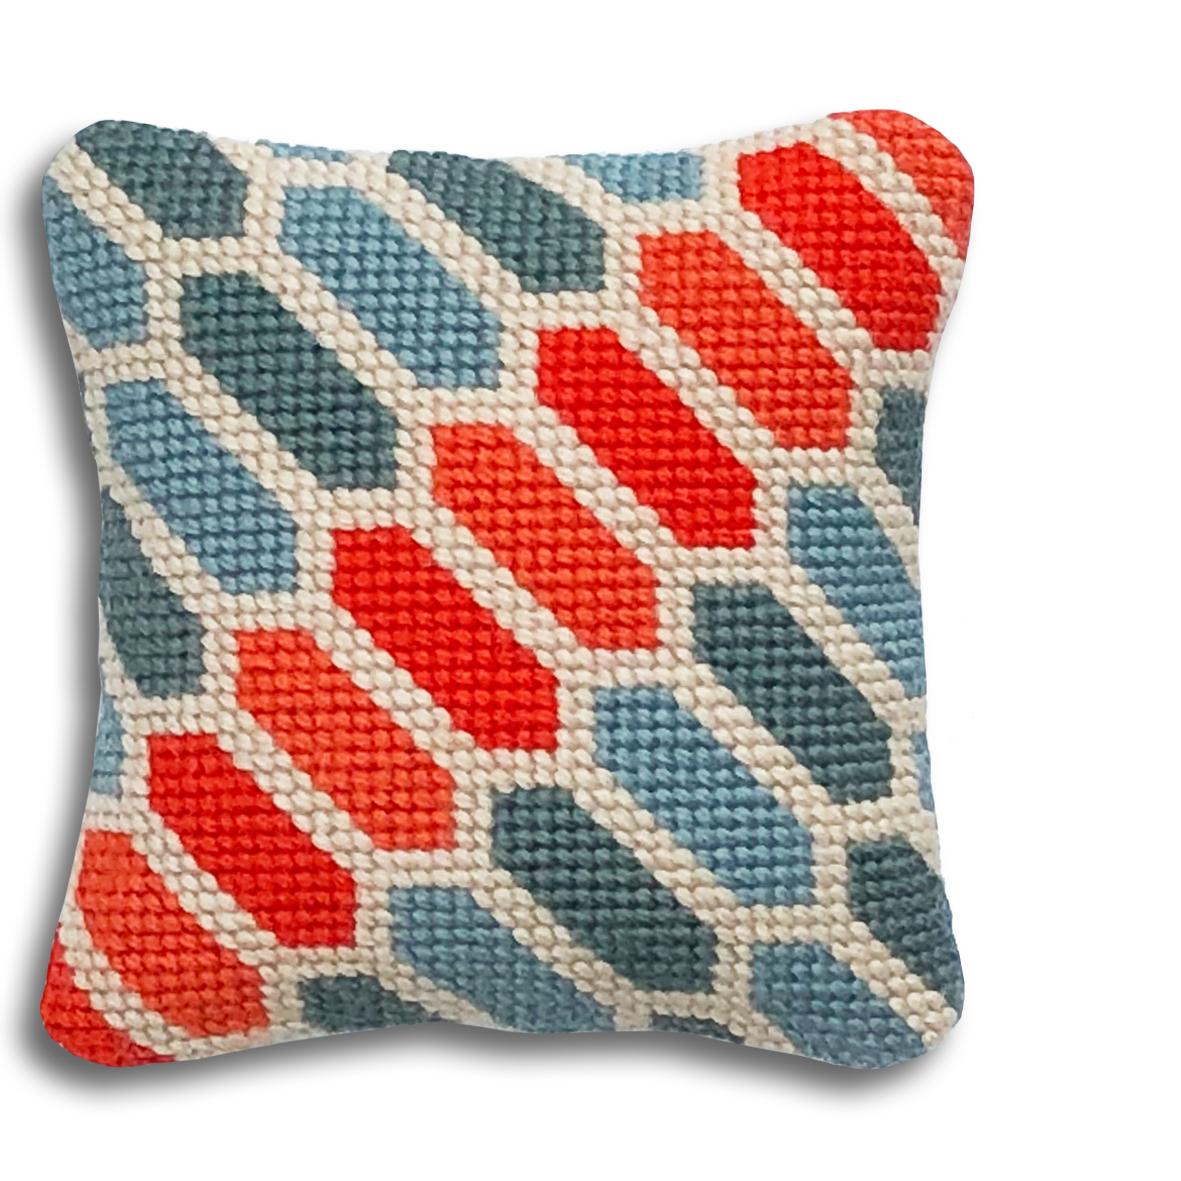 Geometric Hexagons mini kit    Blue and orange colourway  £16  (includes free UK postage)